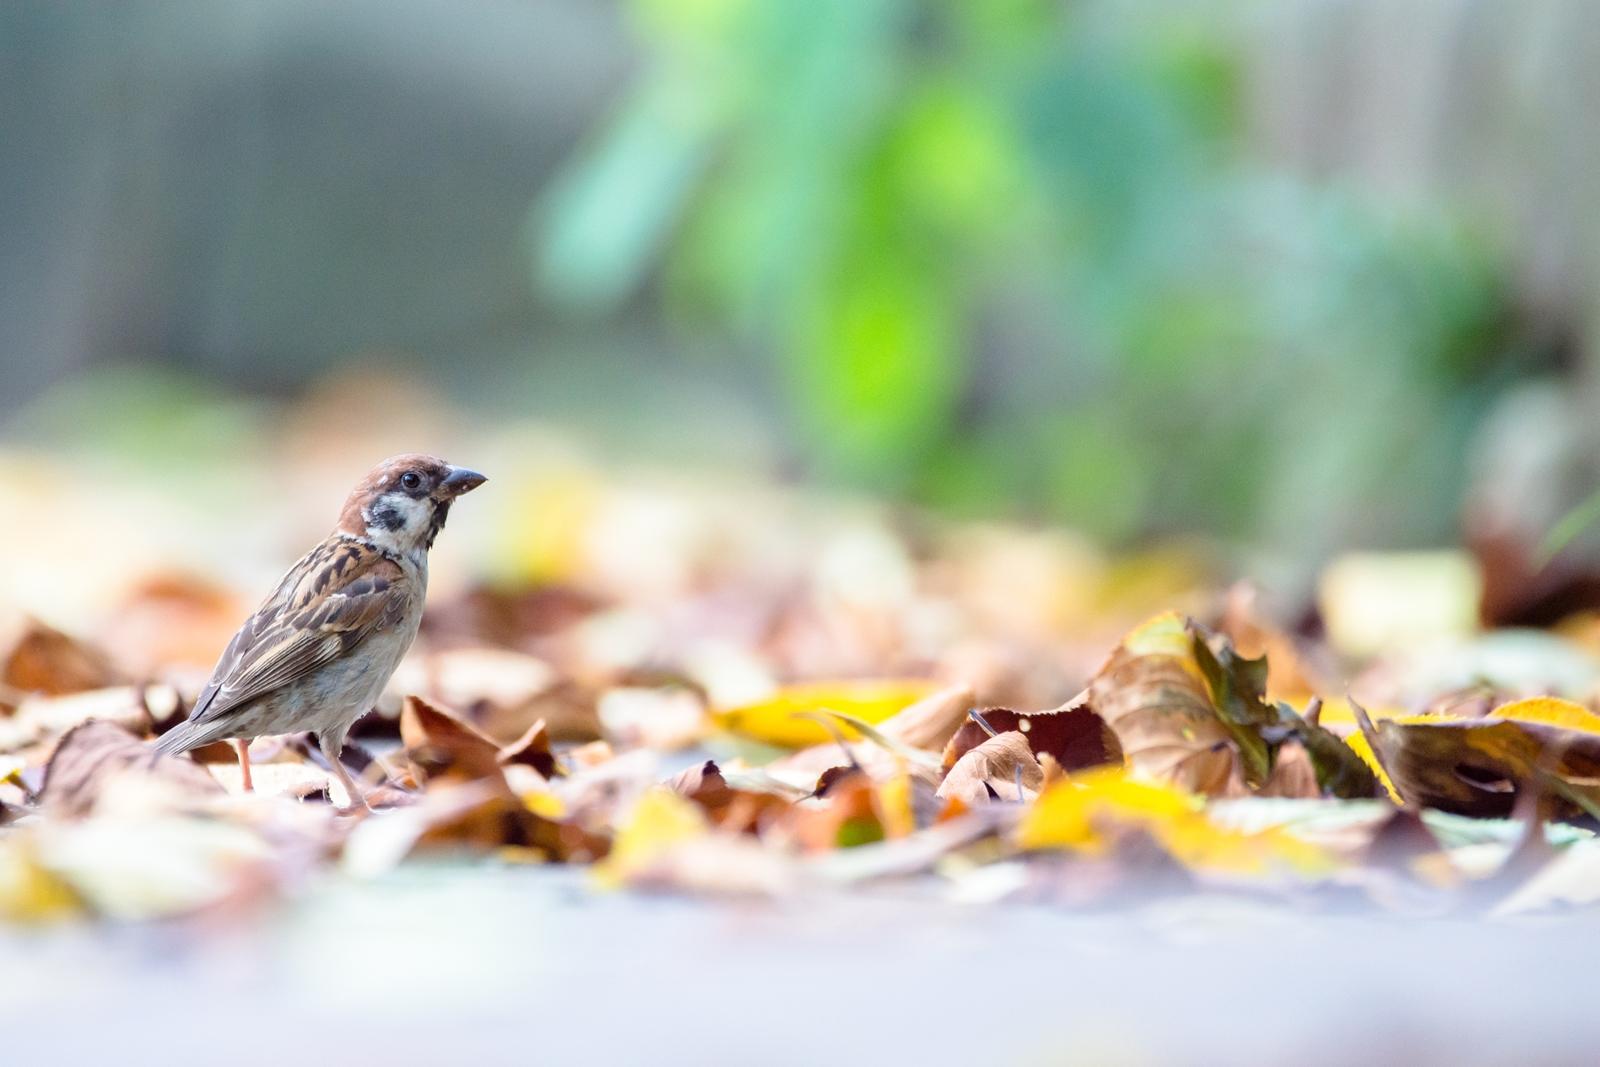 Photo: 葉が落ちる Fallen leaves.  あんなに力強く あんなに青々とした葉が 気付くと足元に広がっていく 少し寂しい そんな季節が始まる  Sparrow. (雀)  #birdphotography #birds #cooljapan #kawaii #nikon #sigma #sparrow  Nikon D7200 SIGMA 150-600mm F5-6.3 DG OS HSM Contemporary